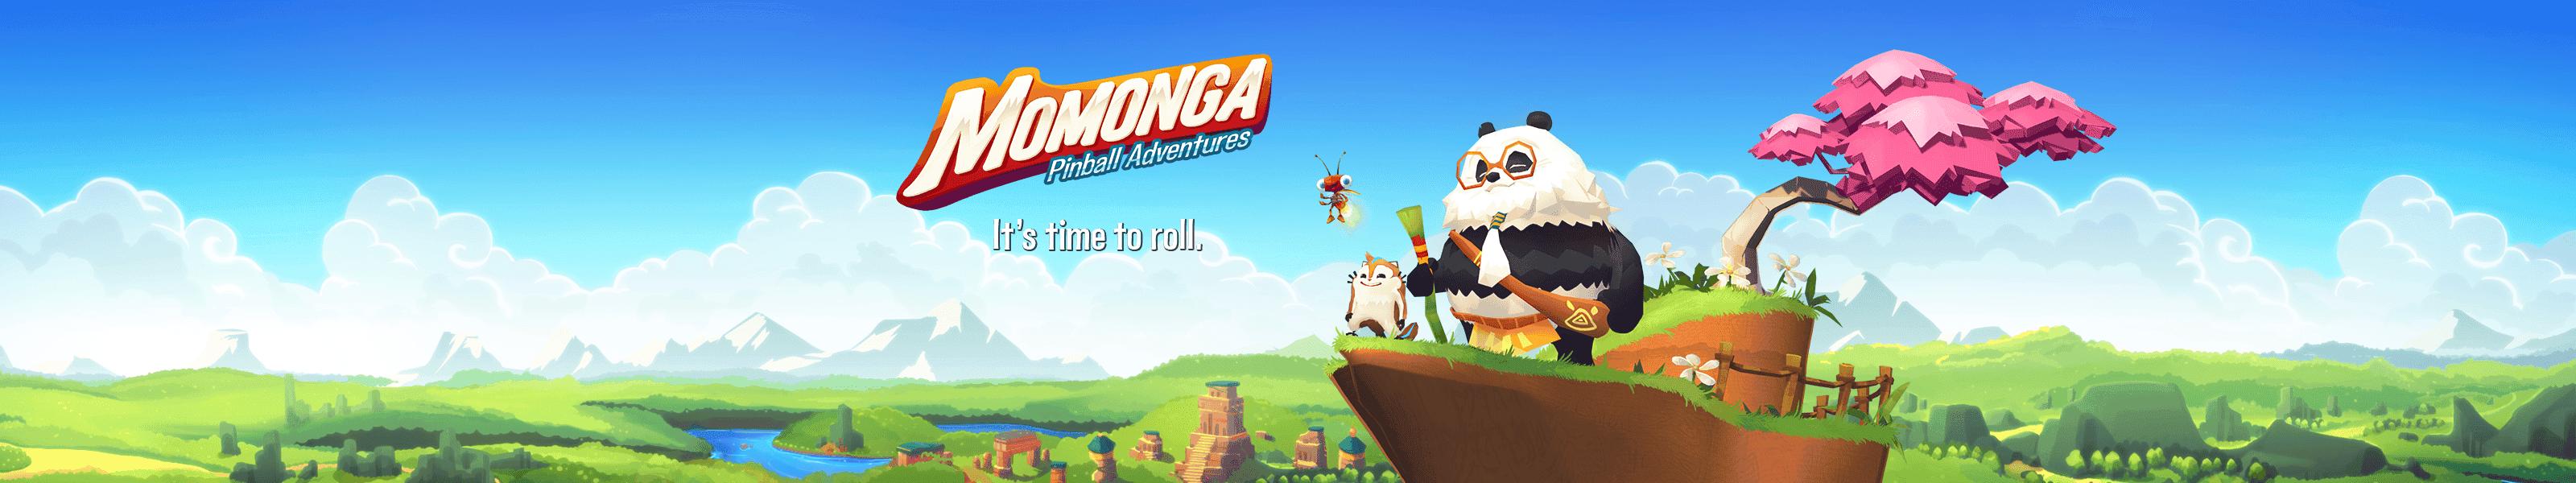 Momonga Banner Wide